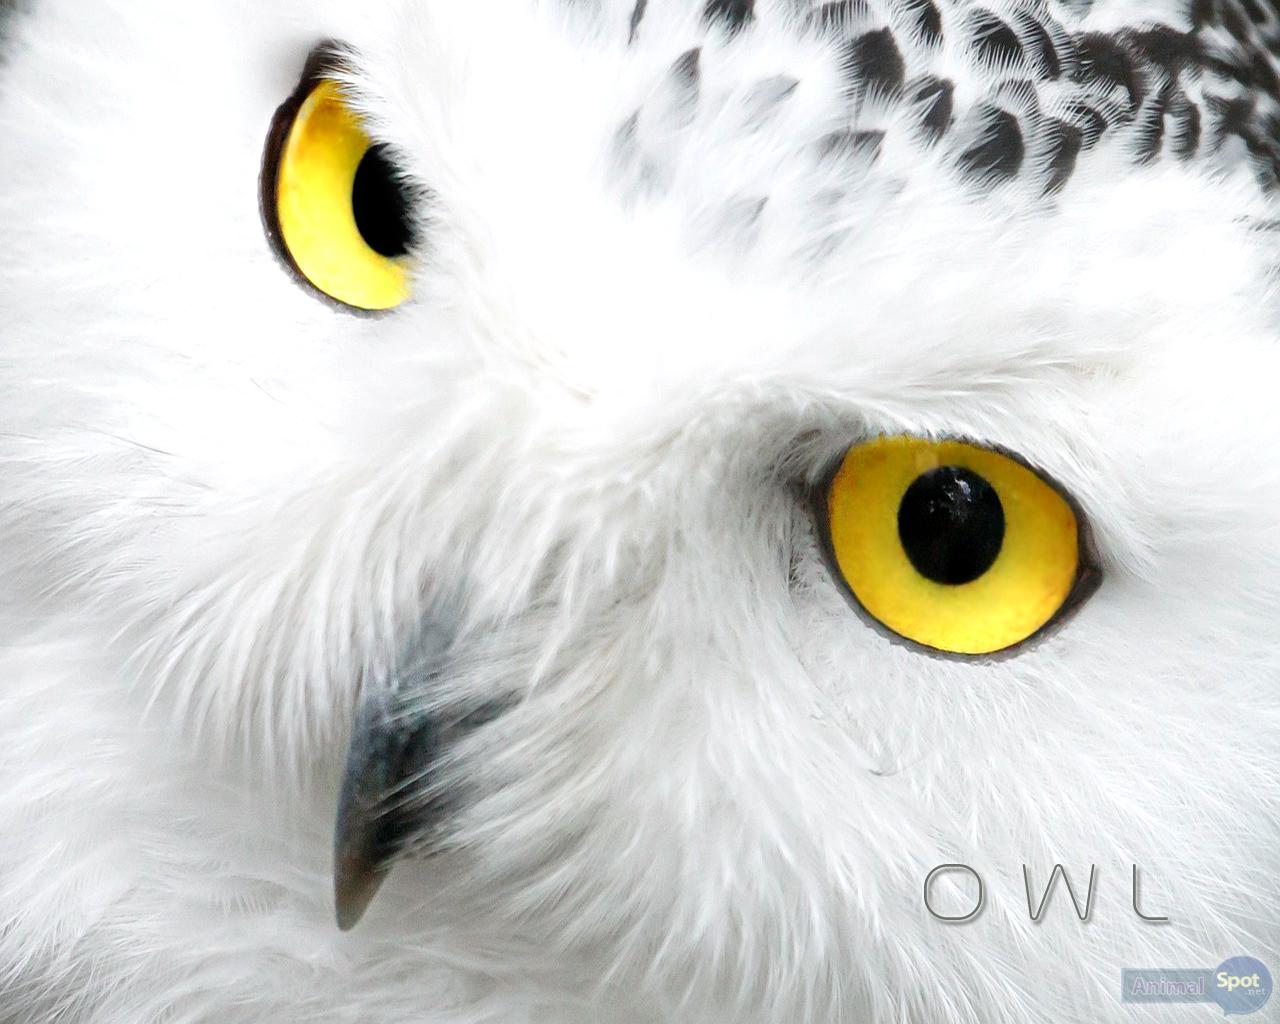 Owl Wallpapers Animal Spot